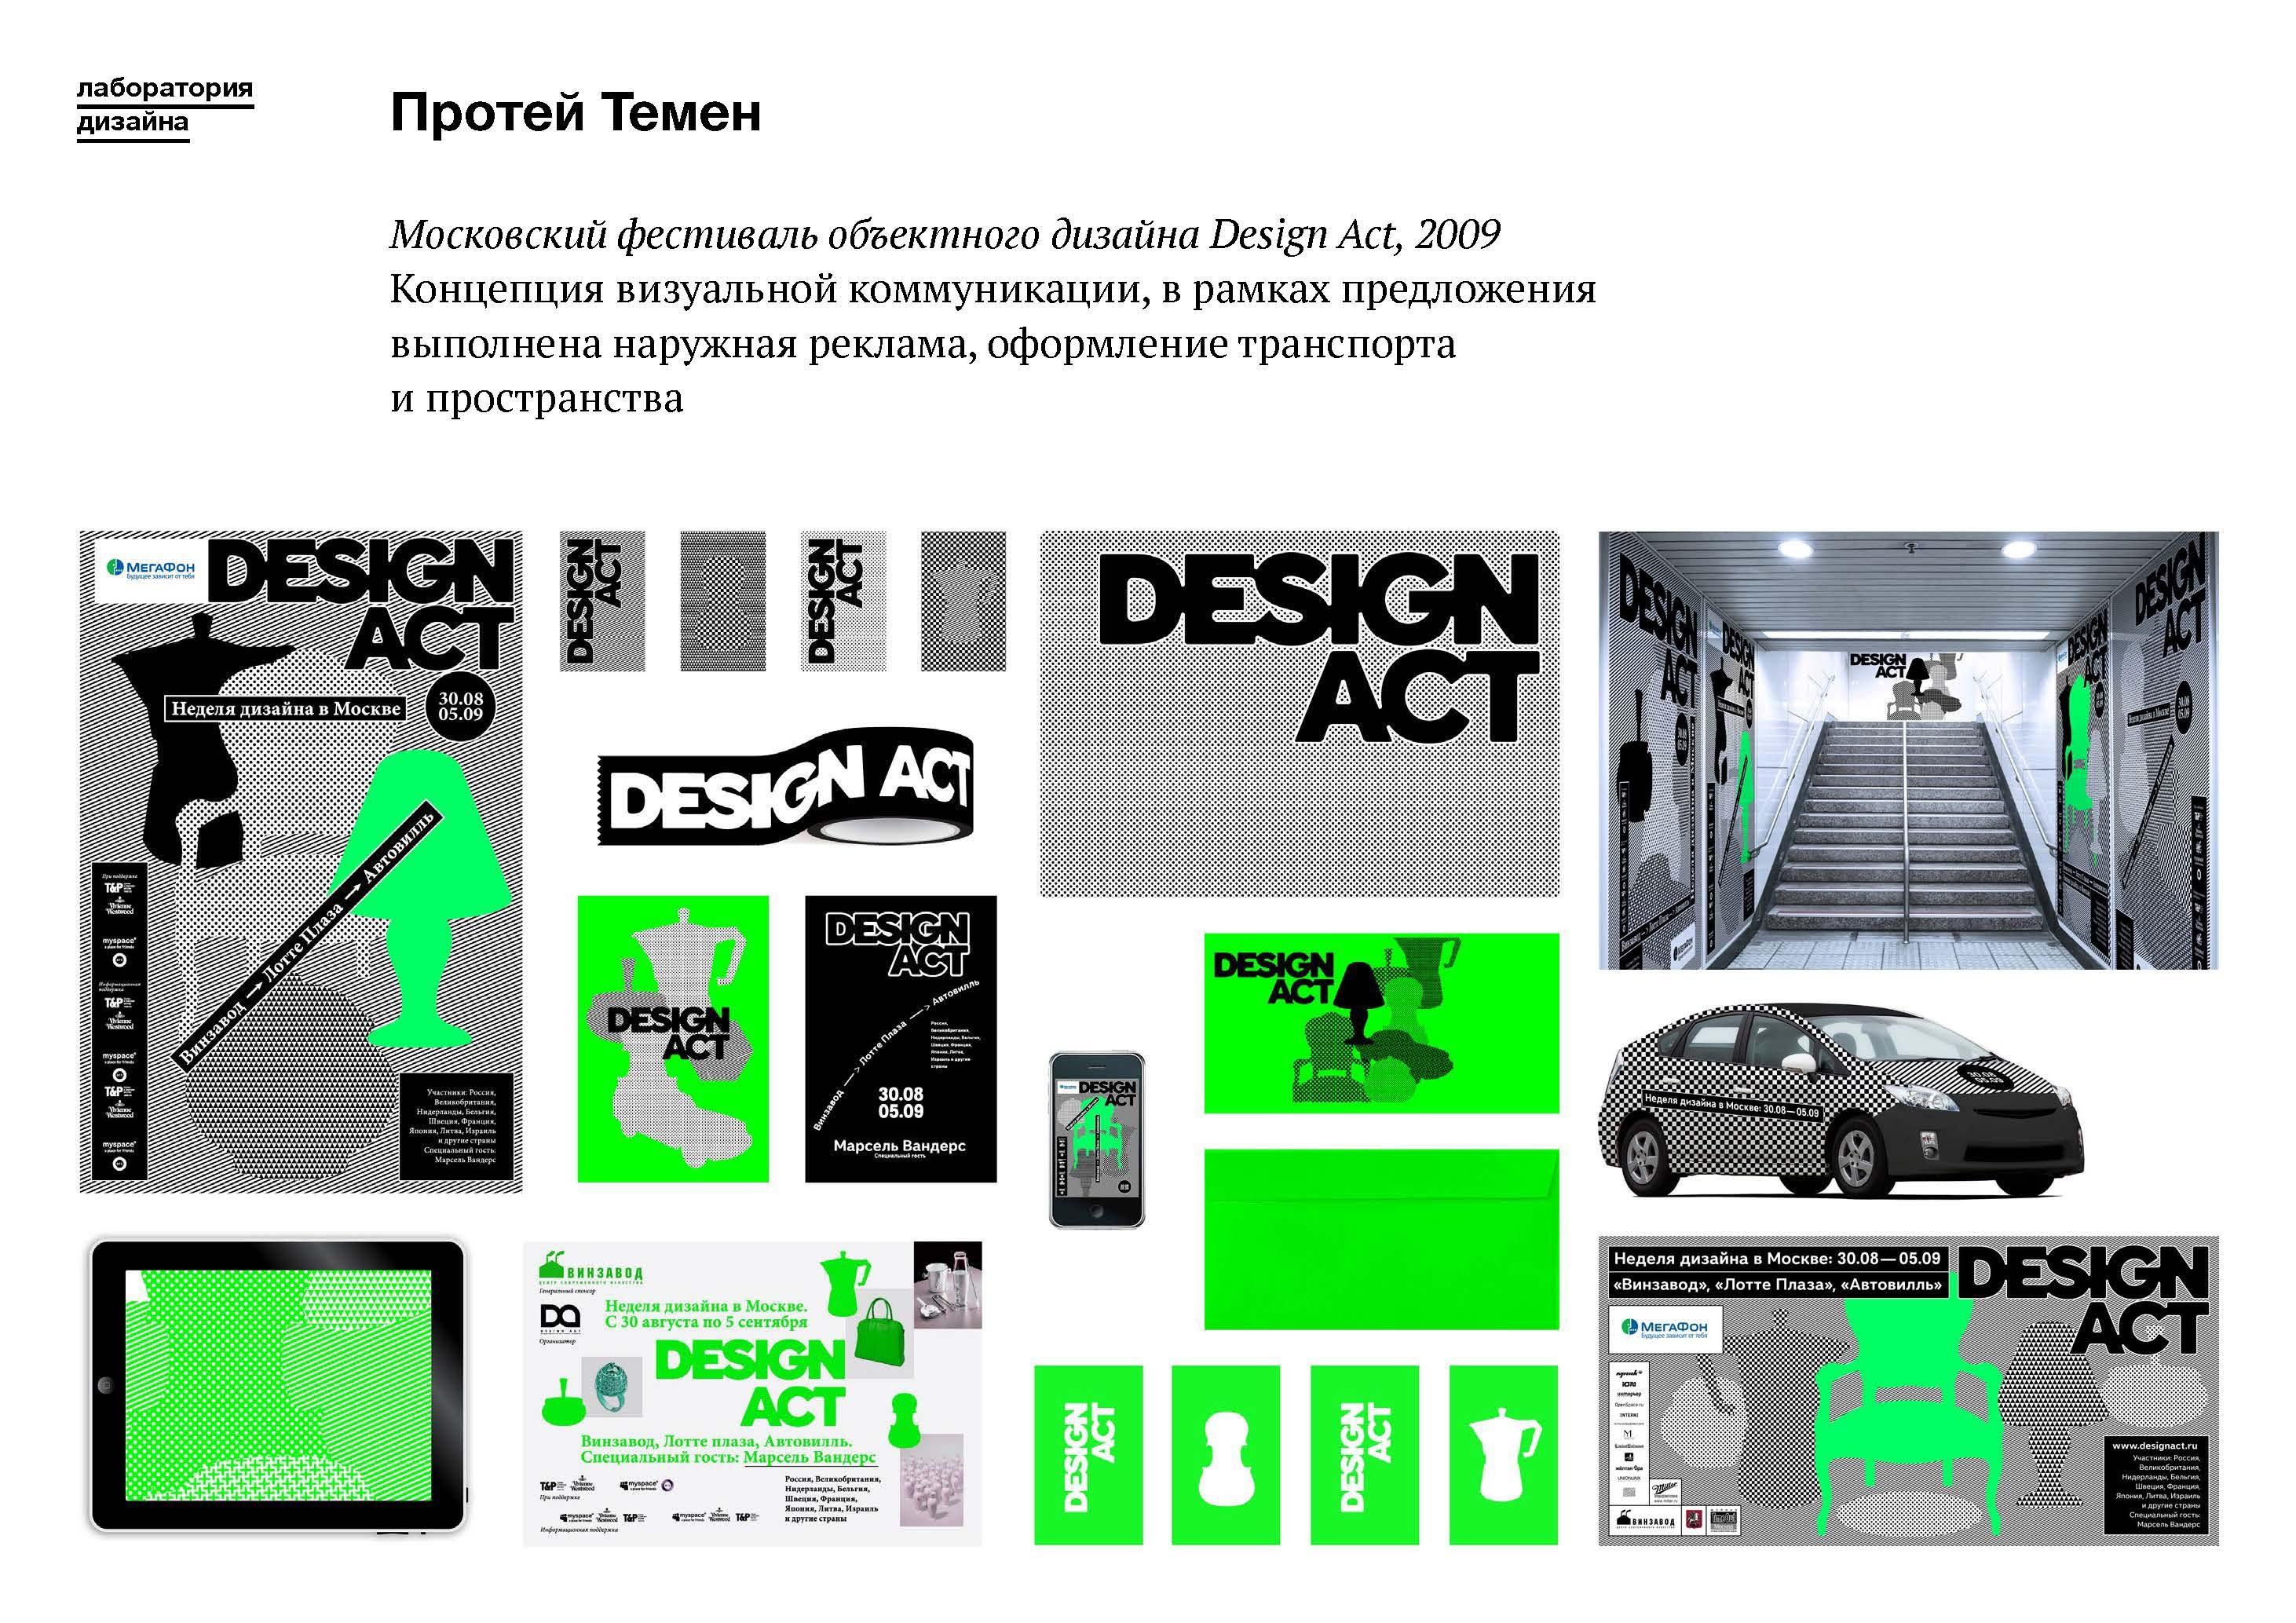 Дизайн портфолио вшэ